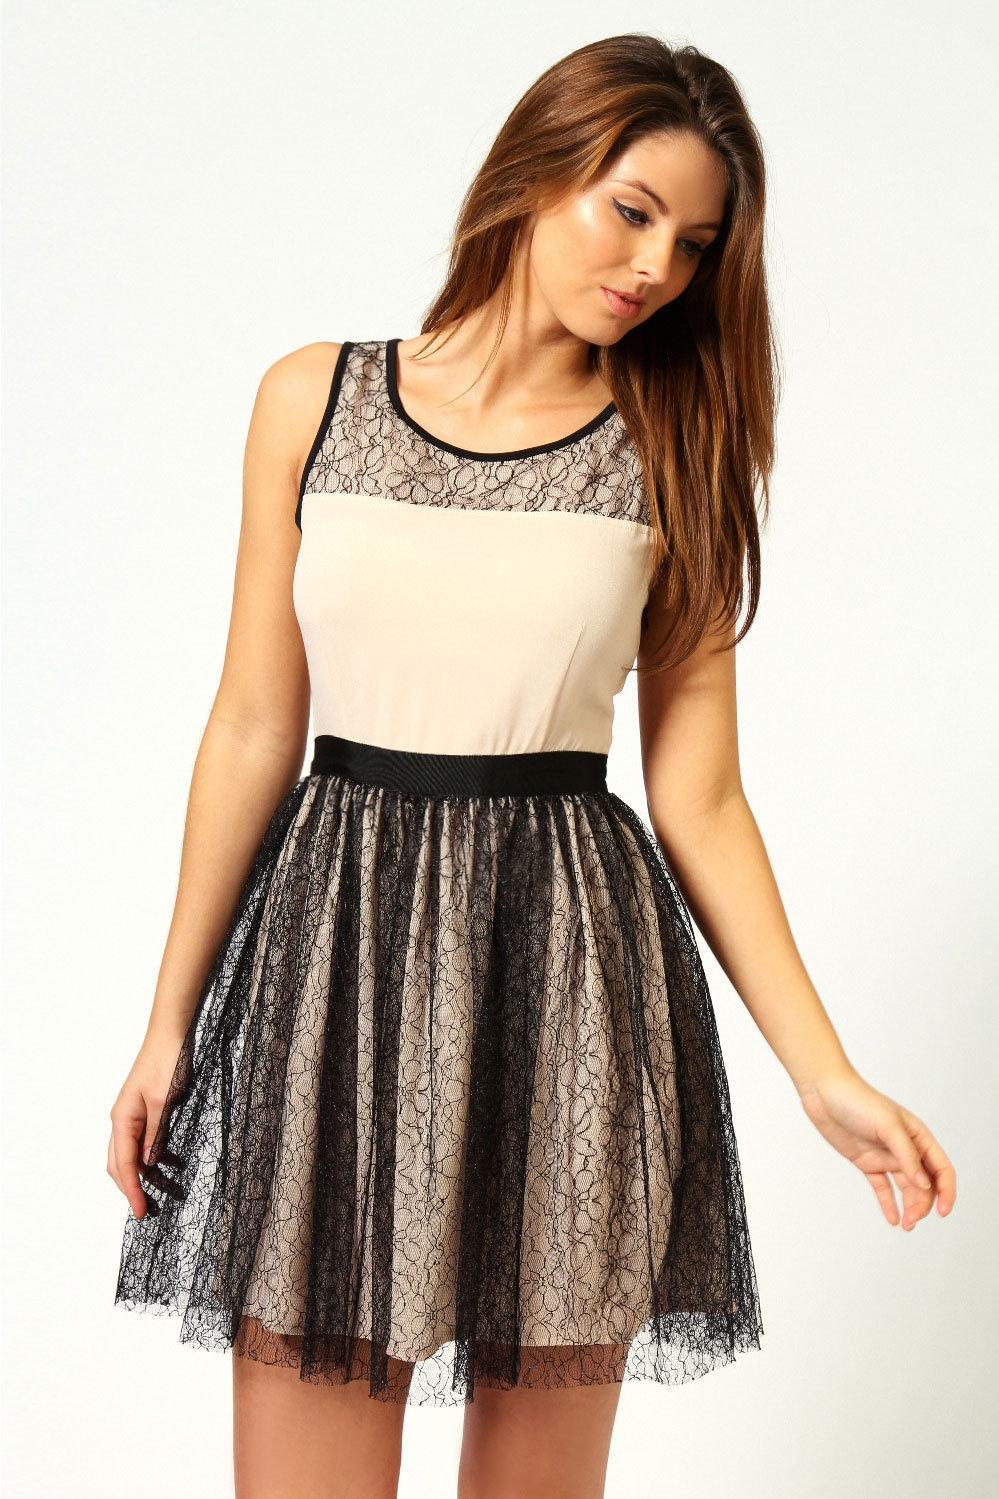 boohoo #Skirt #Delia #Corded #Lace #Skirt #Prom #Dress Delia ...